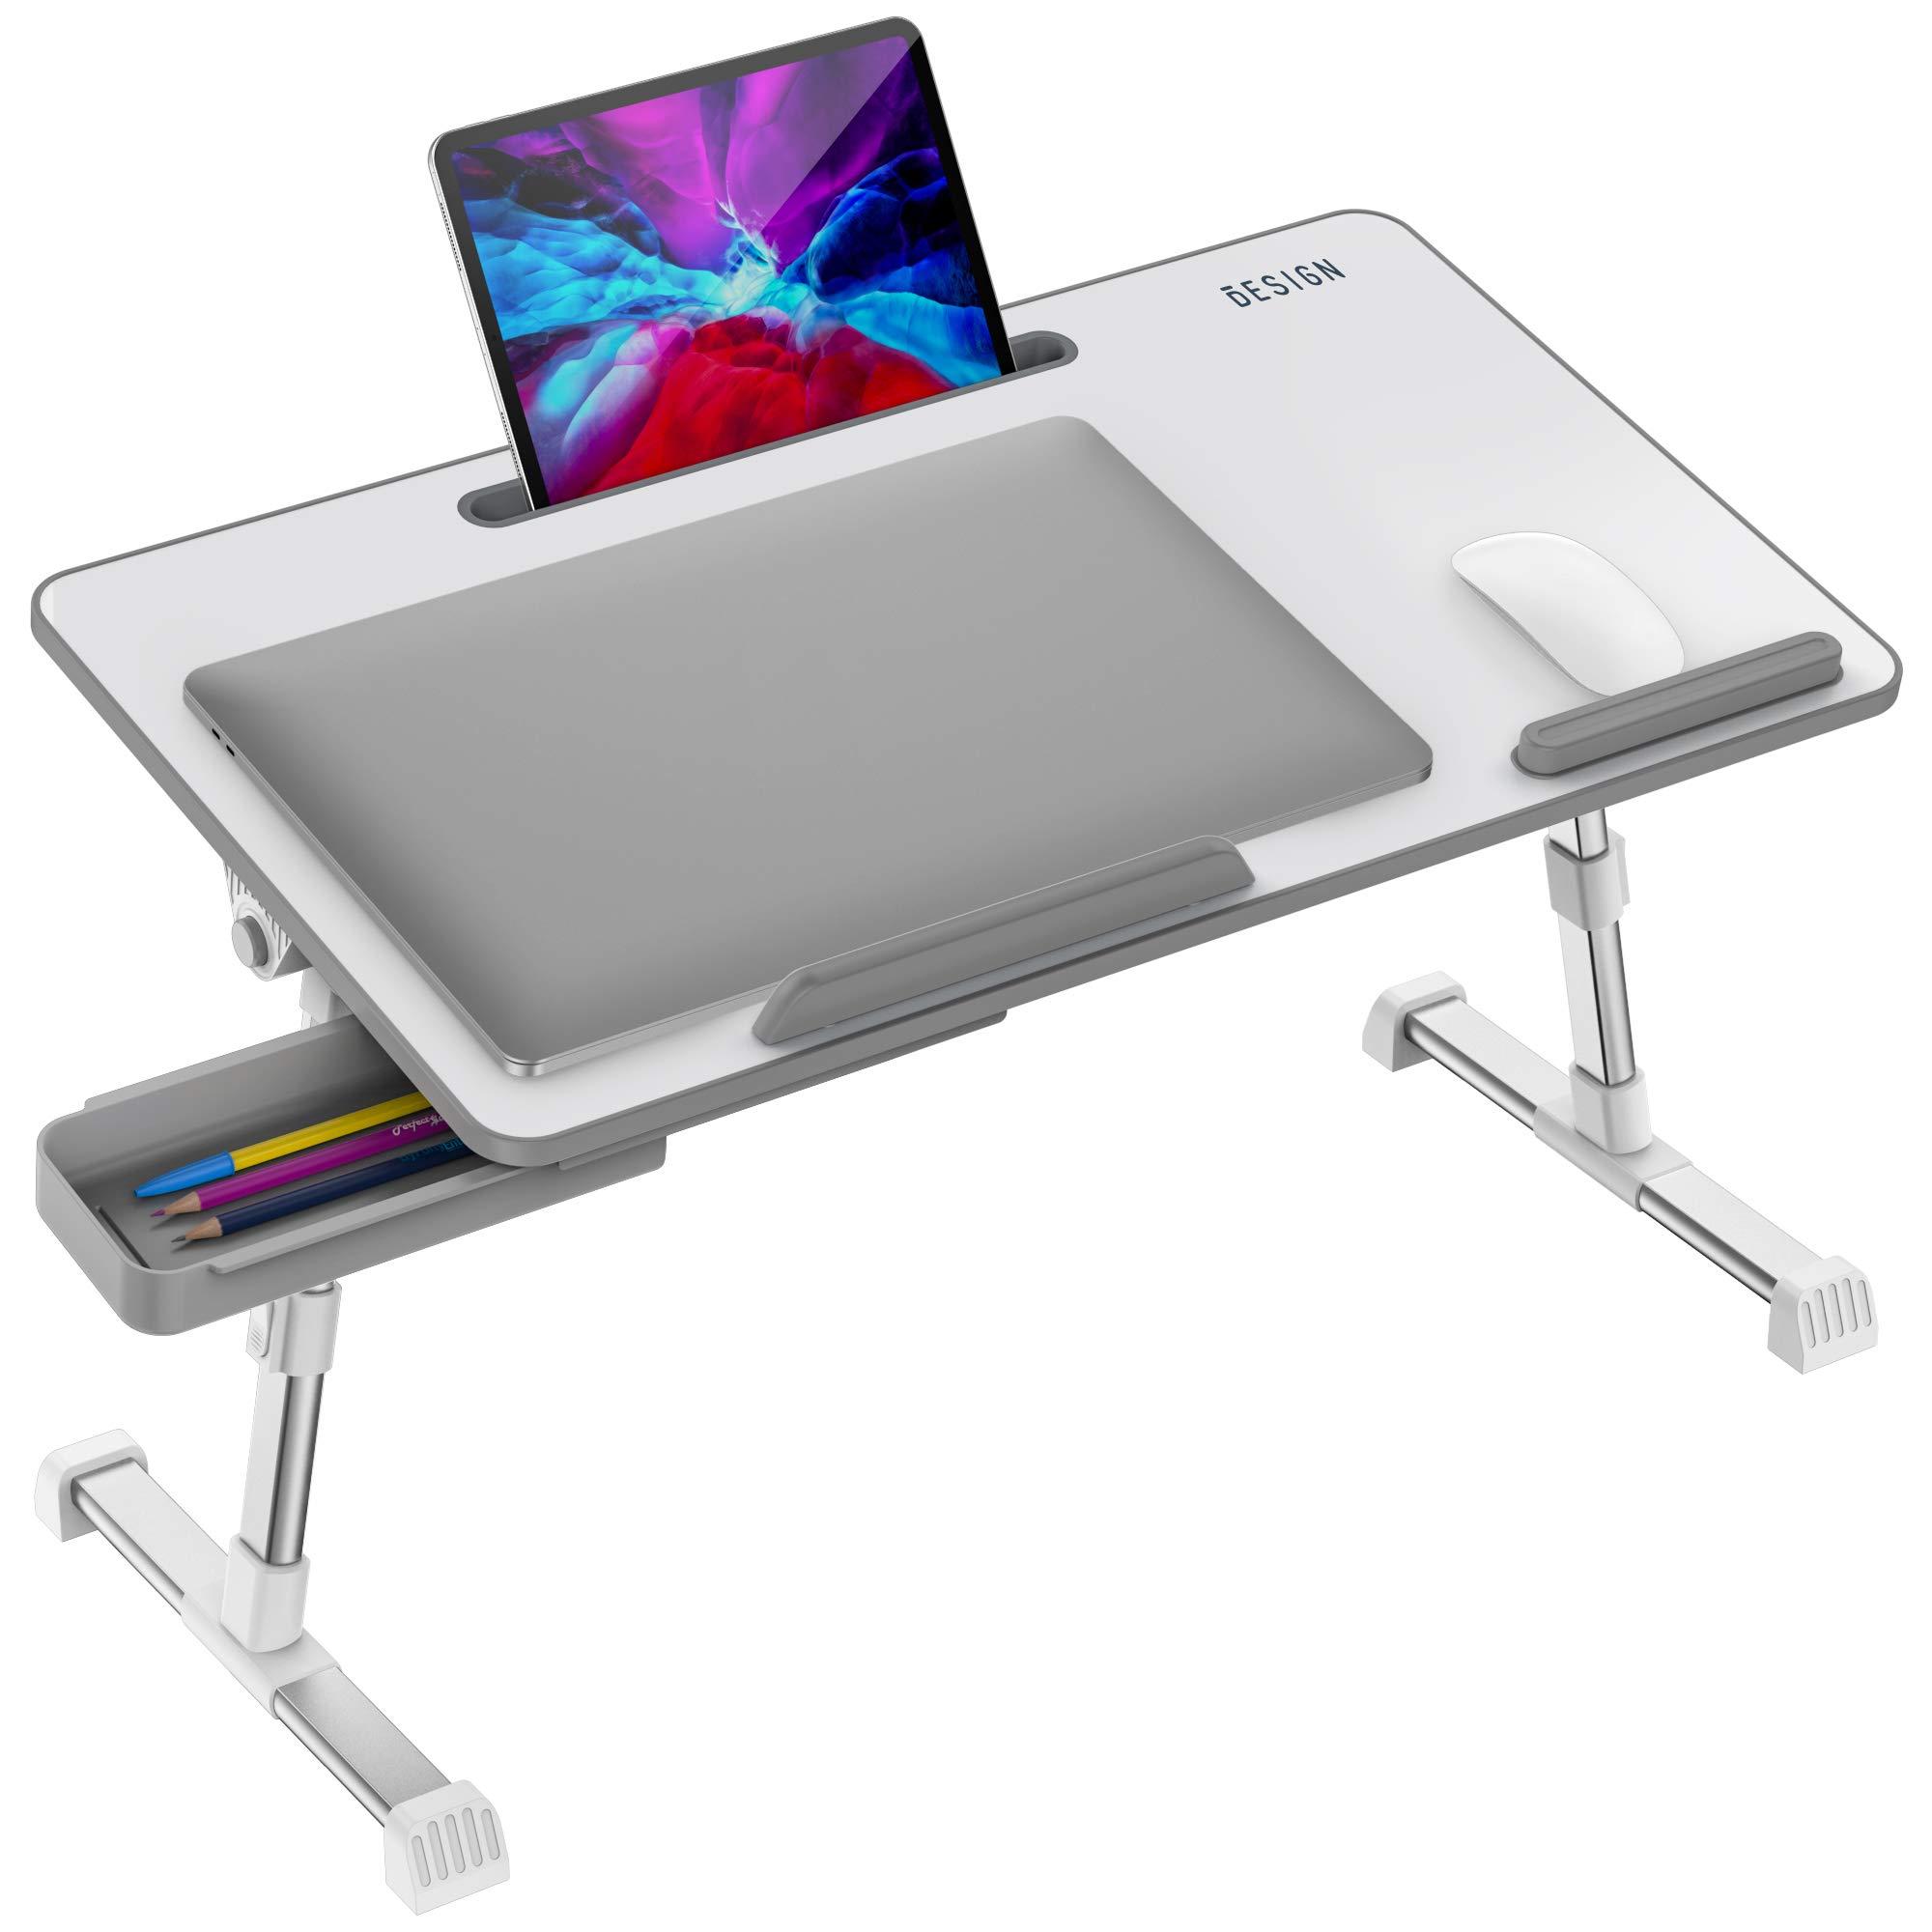 Mesa Plegable y Ajustable para Notebook - BESIGN - 89ZCP17B